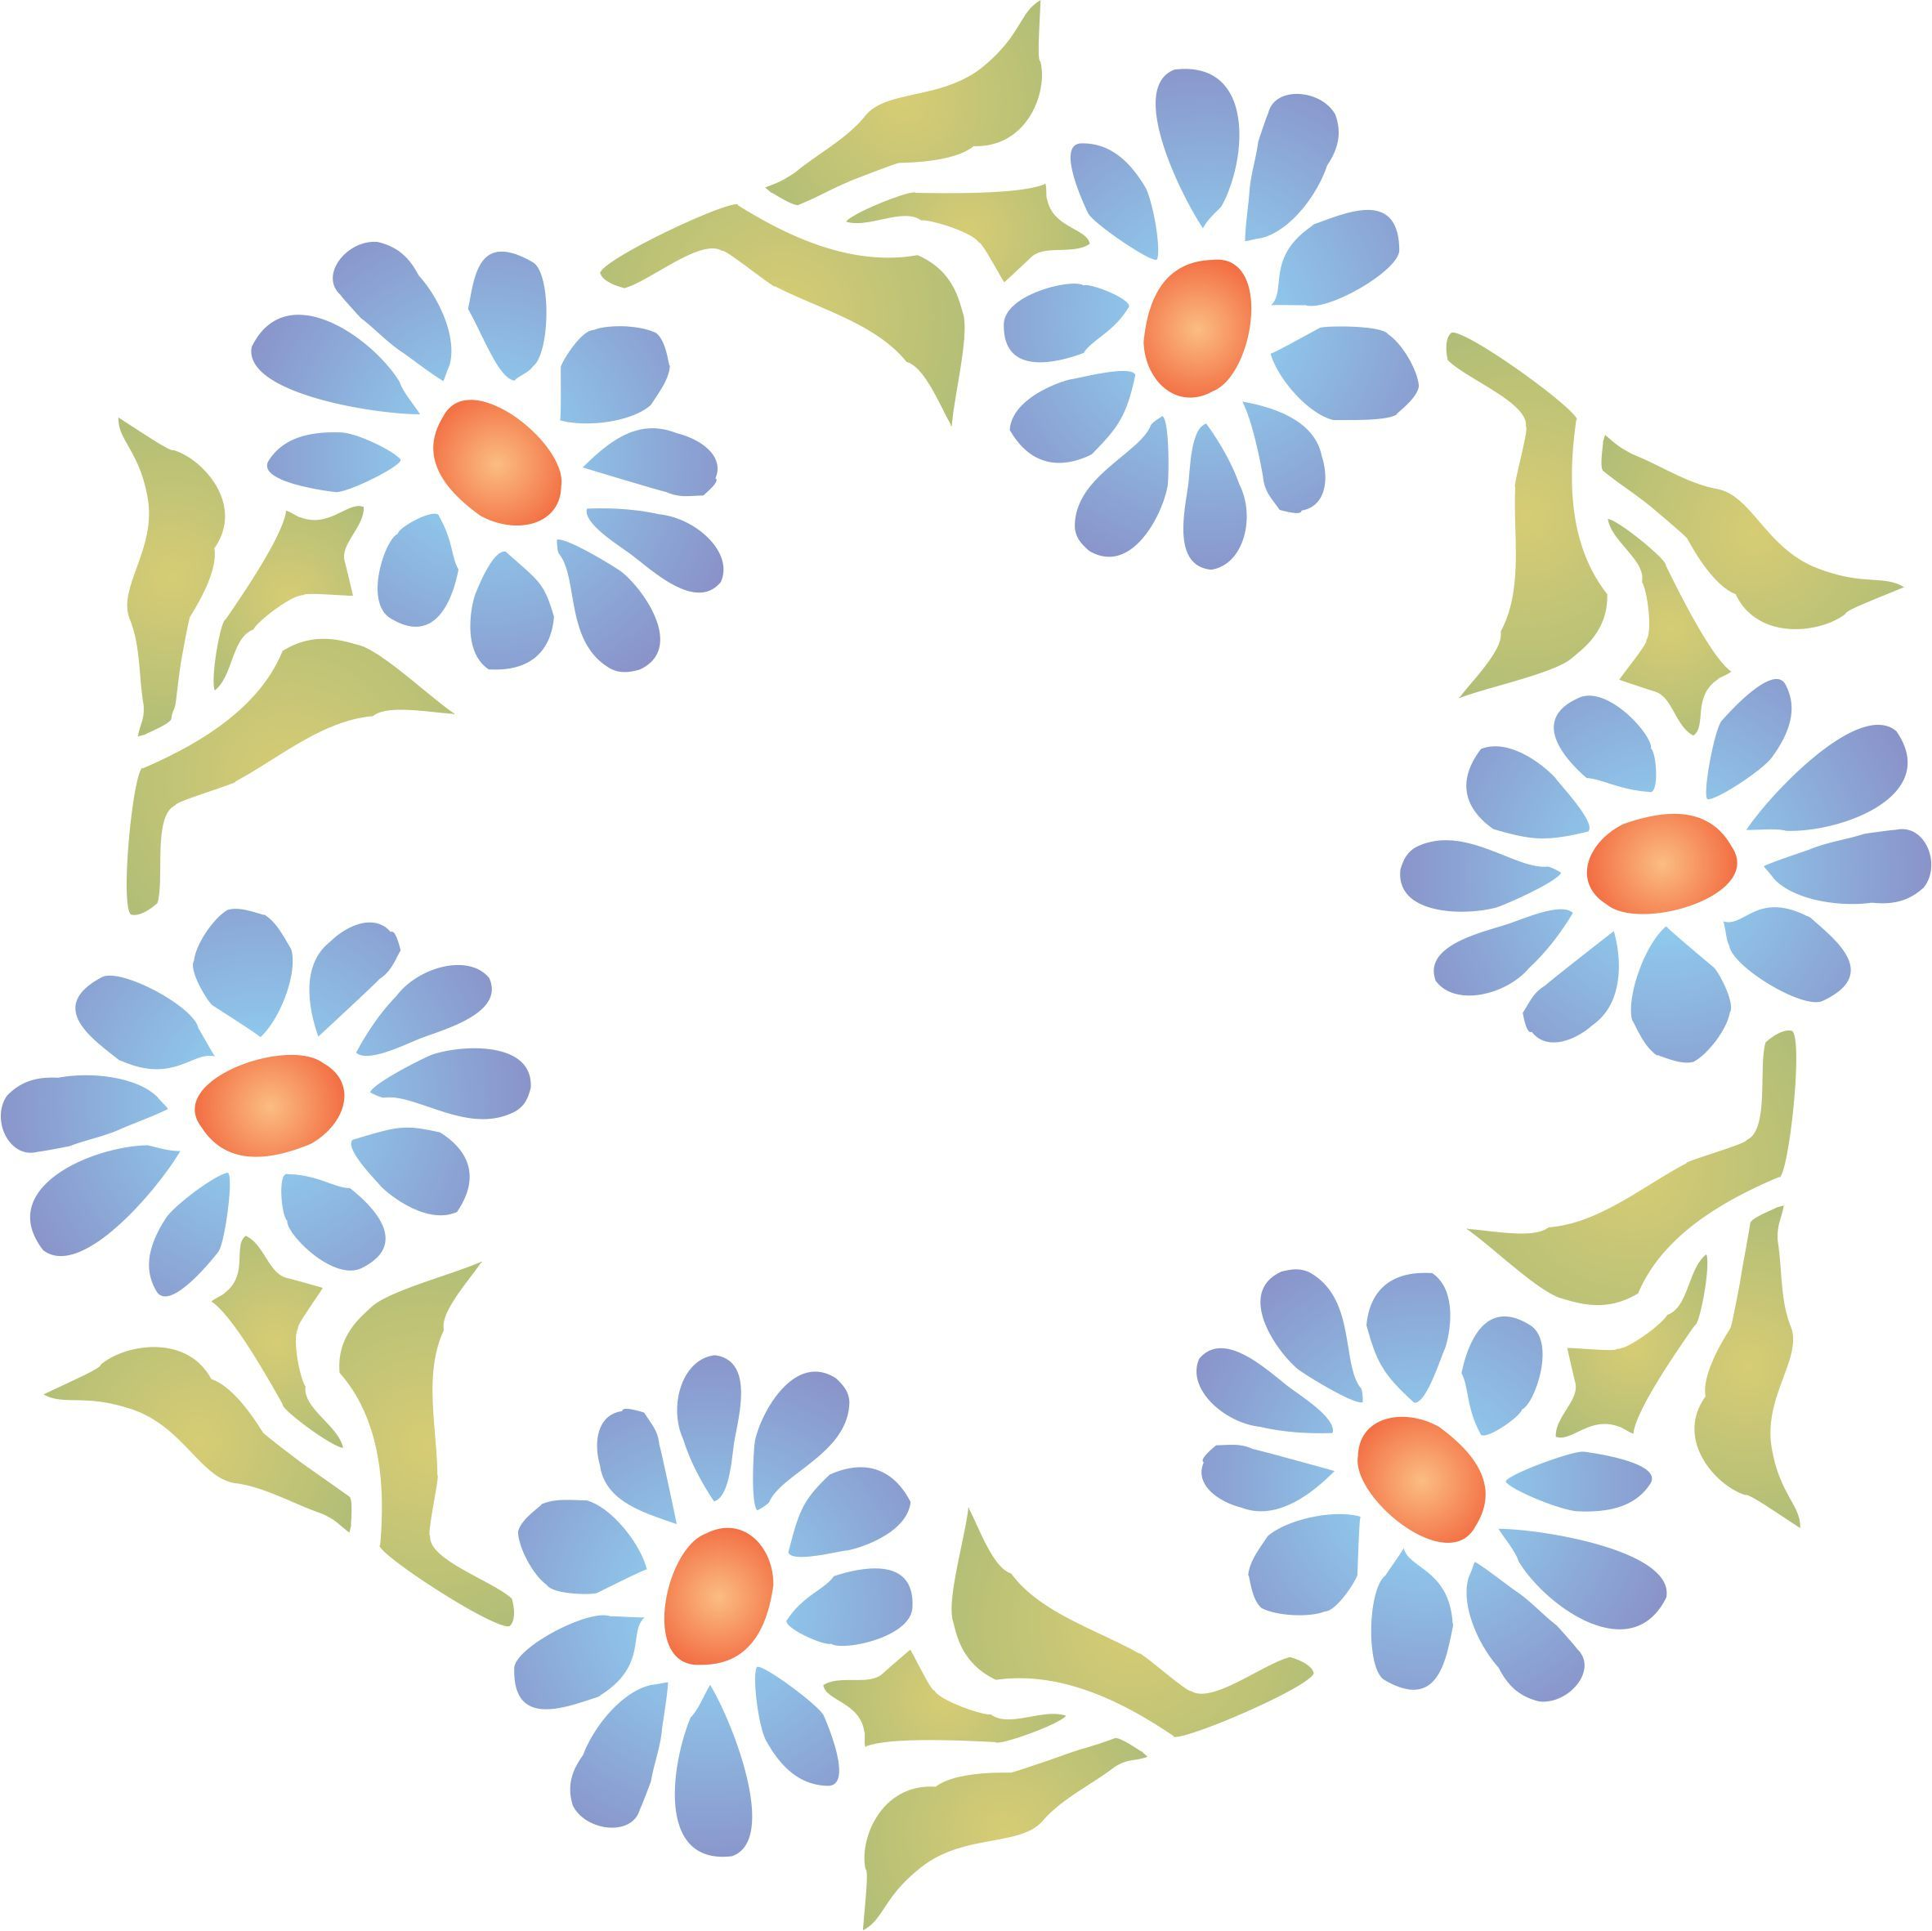 Gerber daisy wreath stencil httpamazondpb00ydw7izqm gerber daisy wreath stencil httpamazondp amipublicfo Gallery